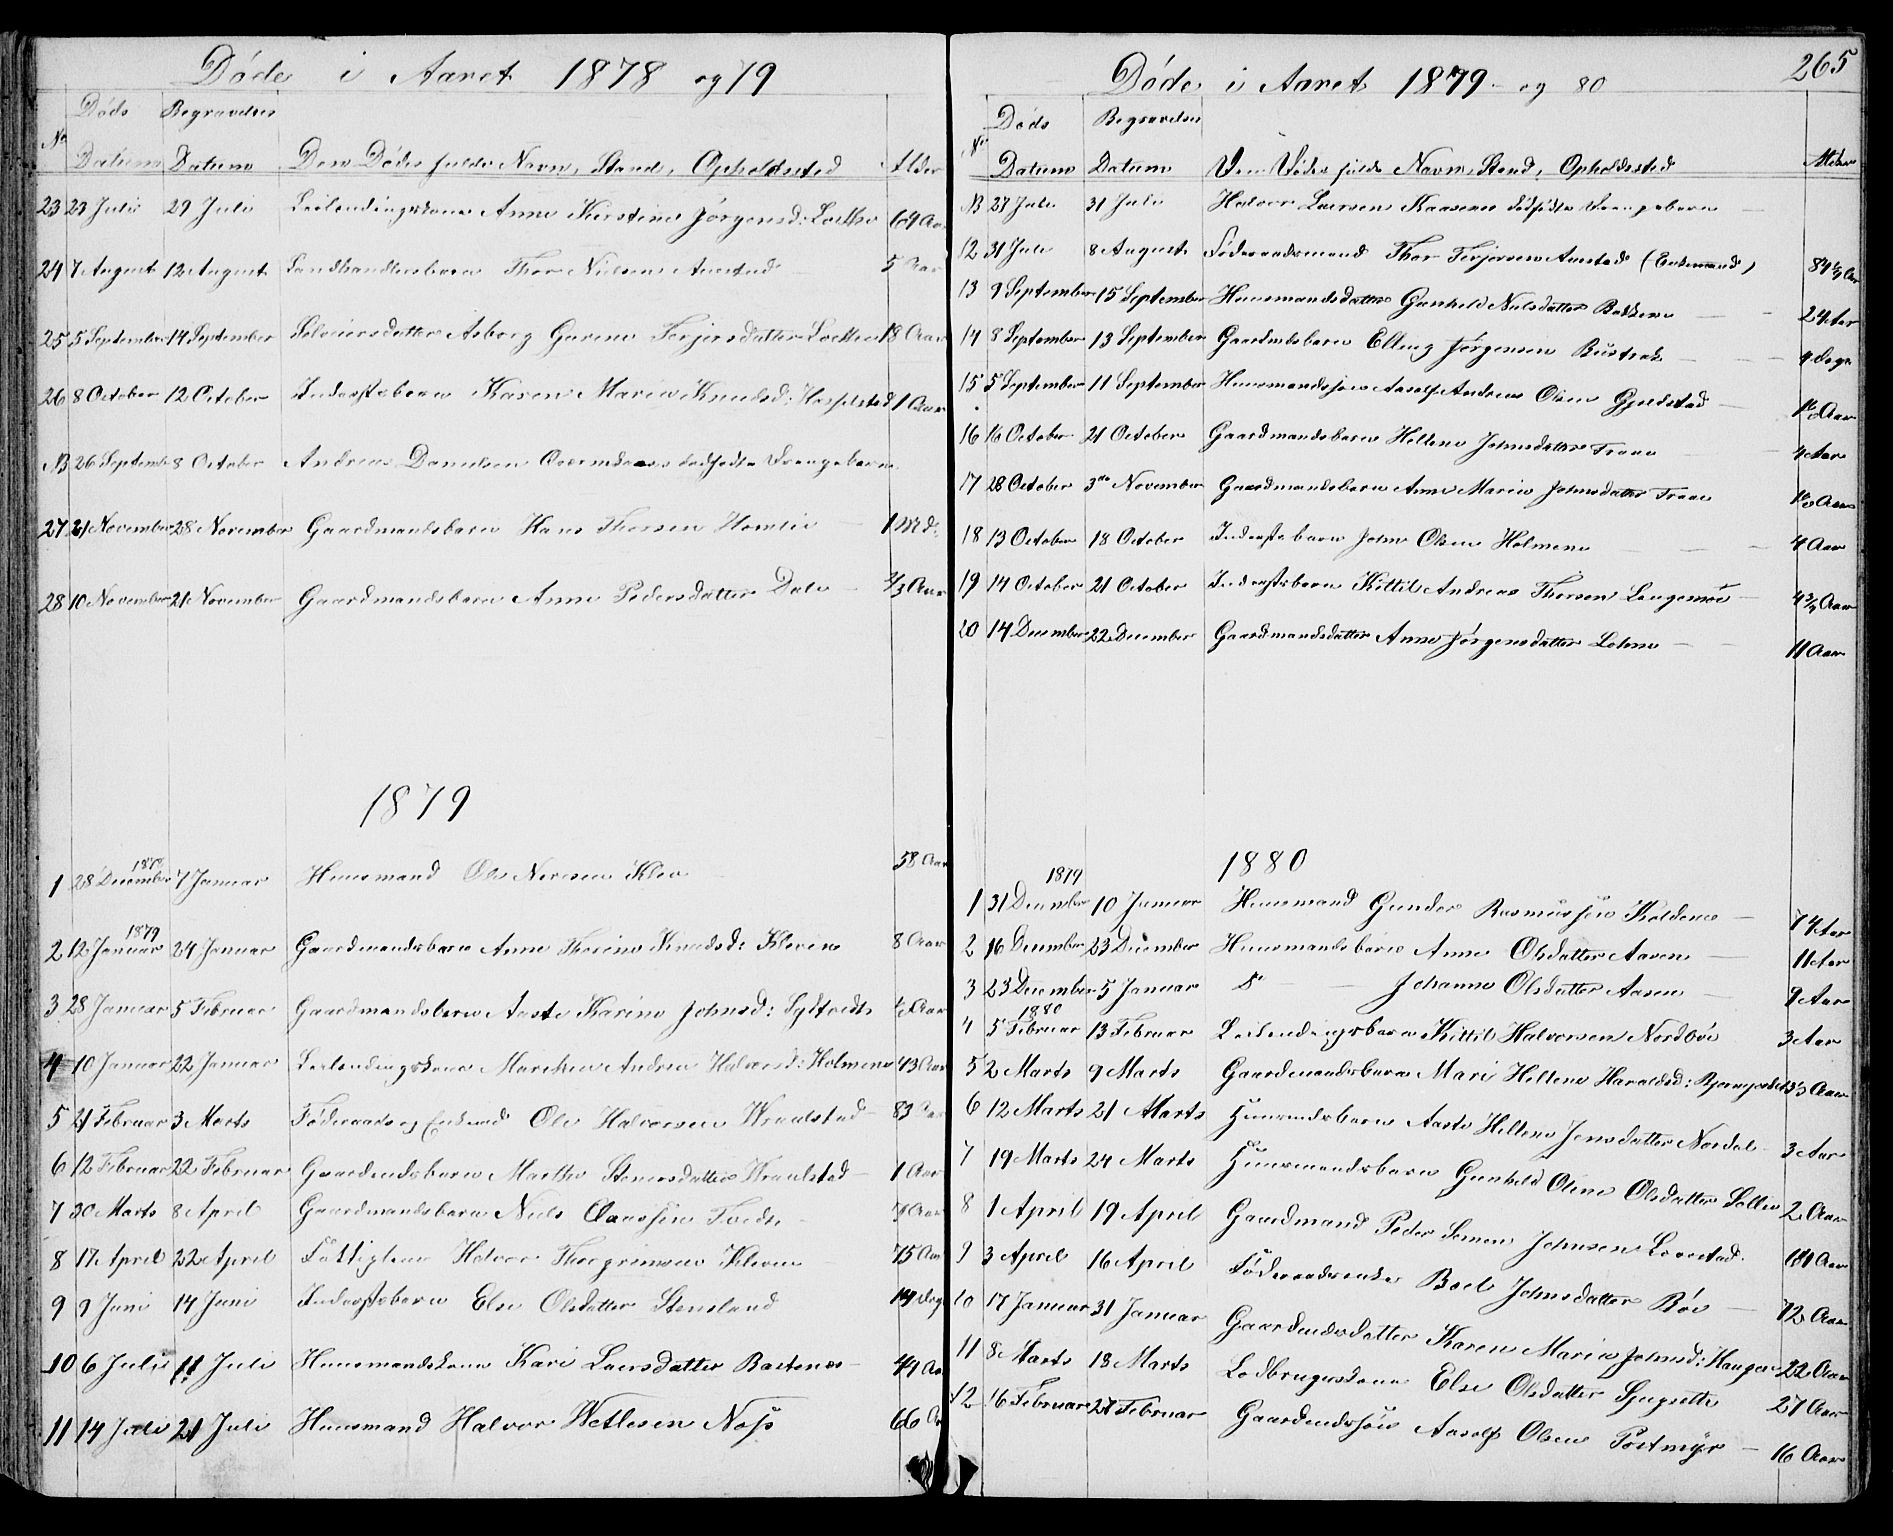 SAKO, Drangedal kirkebøker, G/Gb/L0001: Klokkerbok nr. II 1, 1856-1894, s. 265